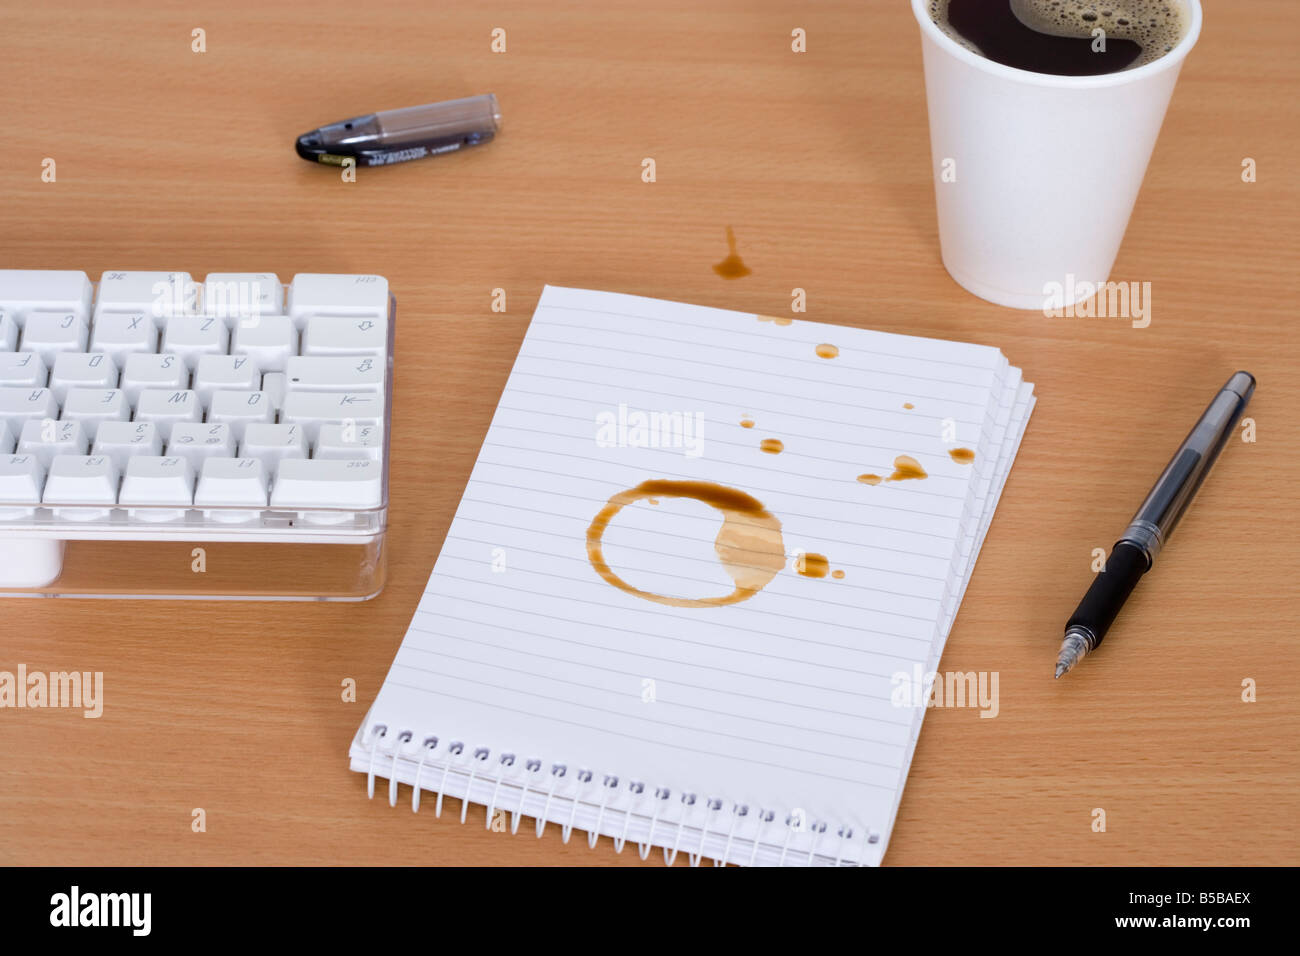 Spilt coffee over notebook on desk - Stock Image